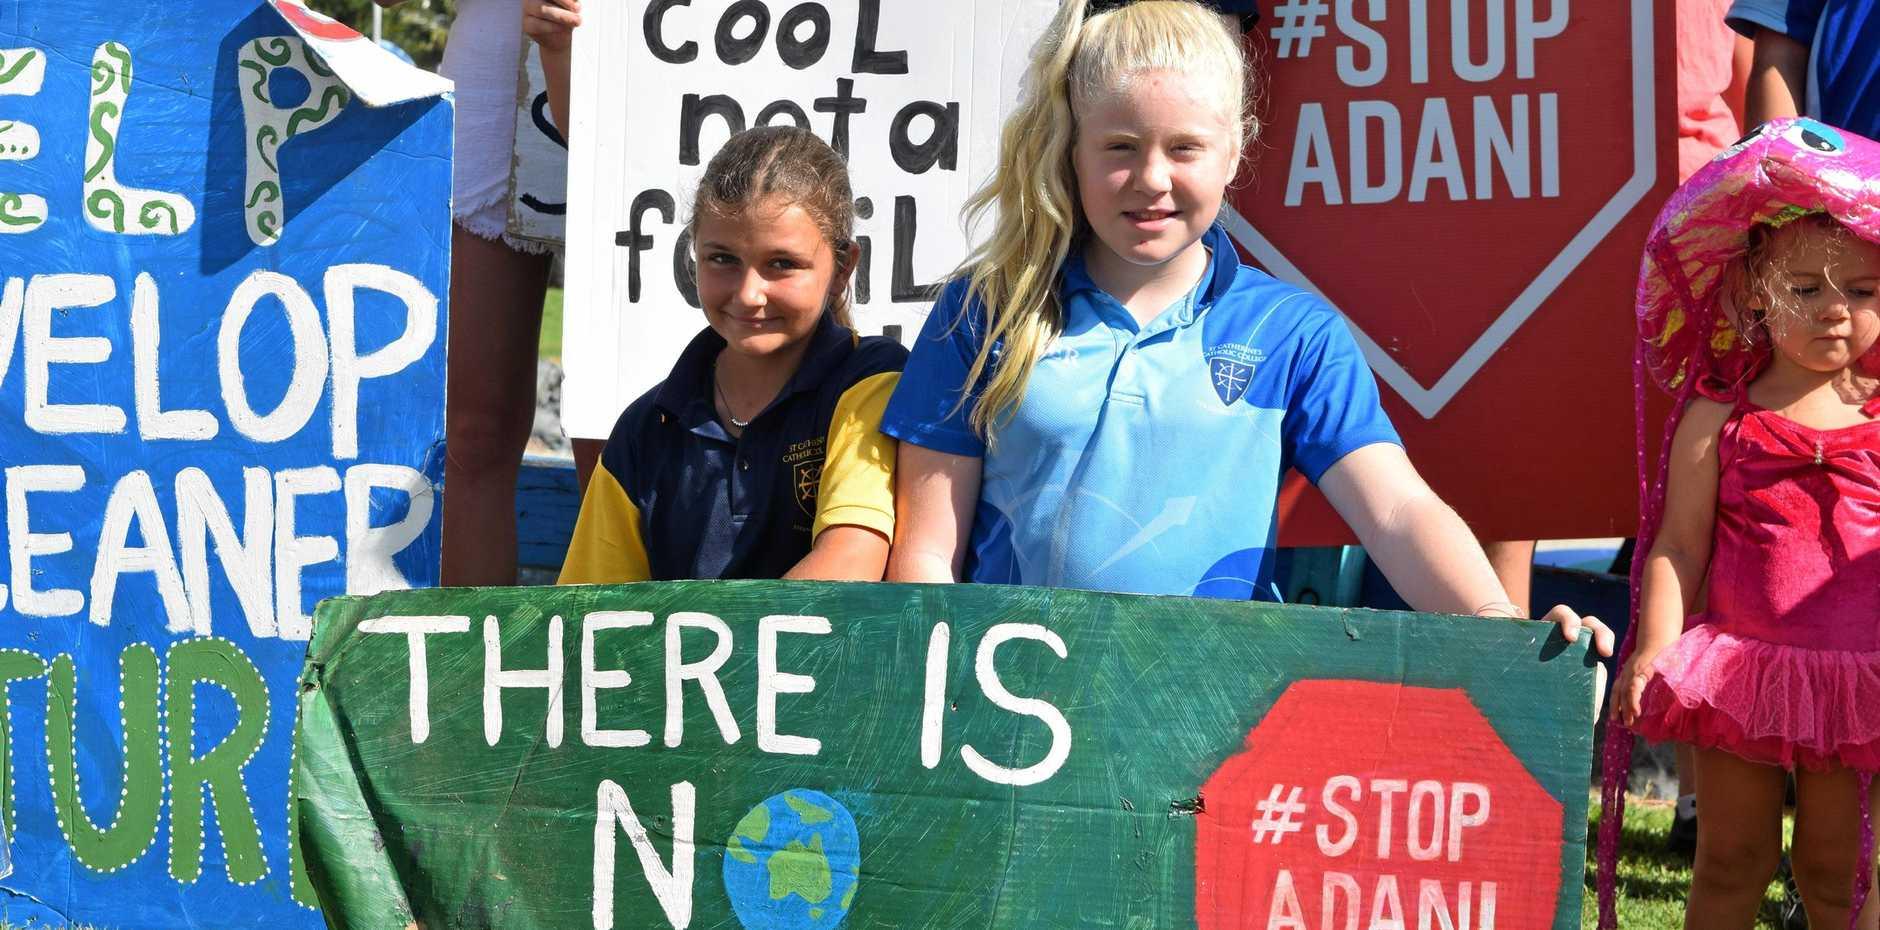 STRIKES: Katie Maund and Mia Duft want their voices heard.